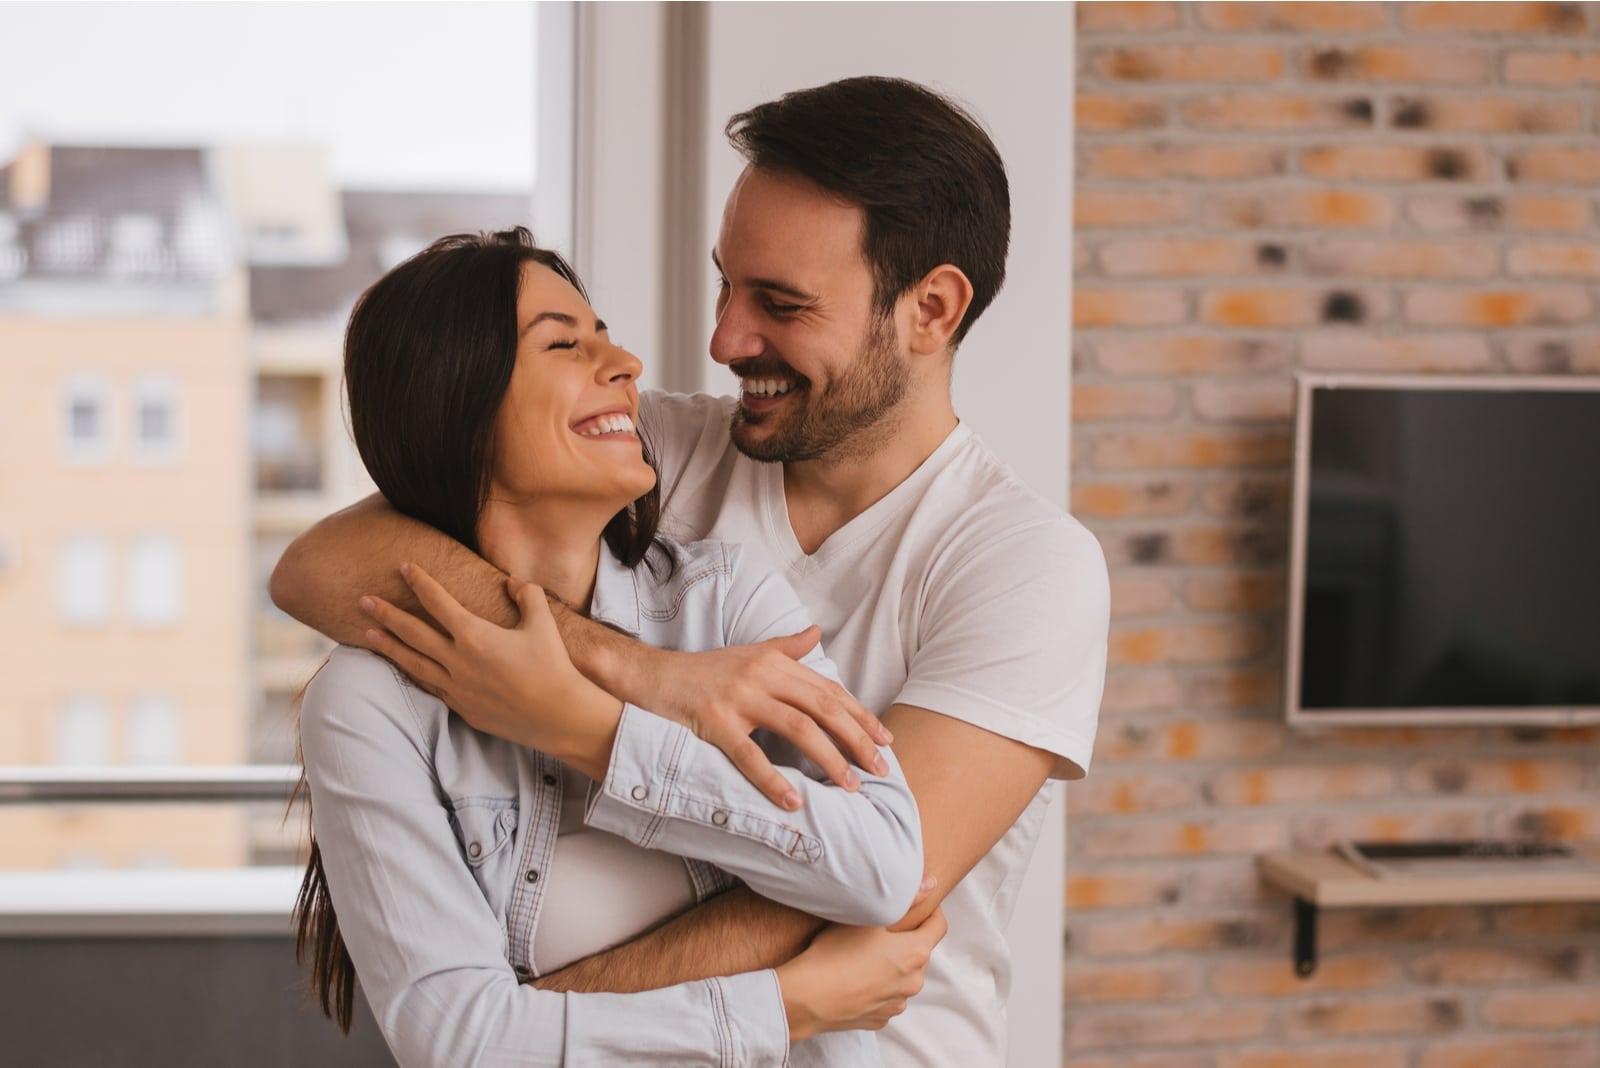 happy man hugging woman while standing indoor